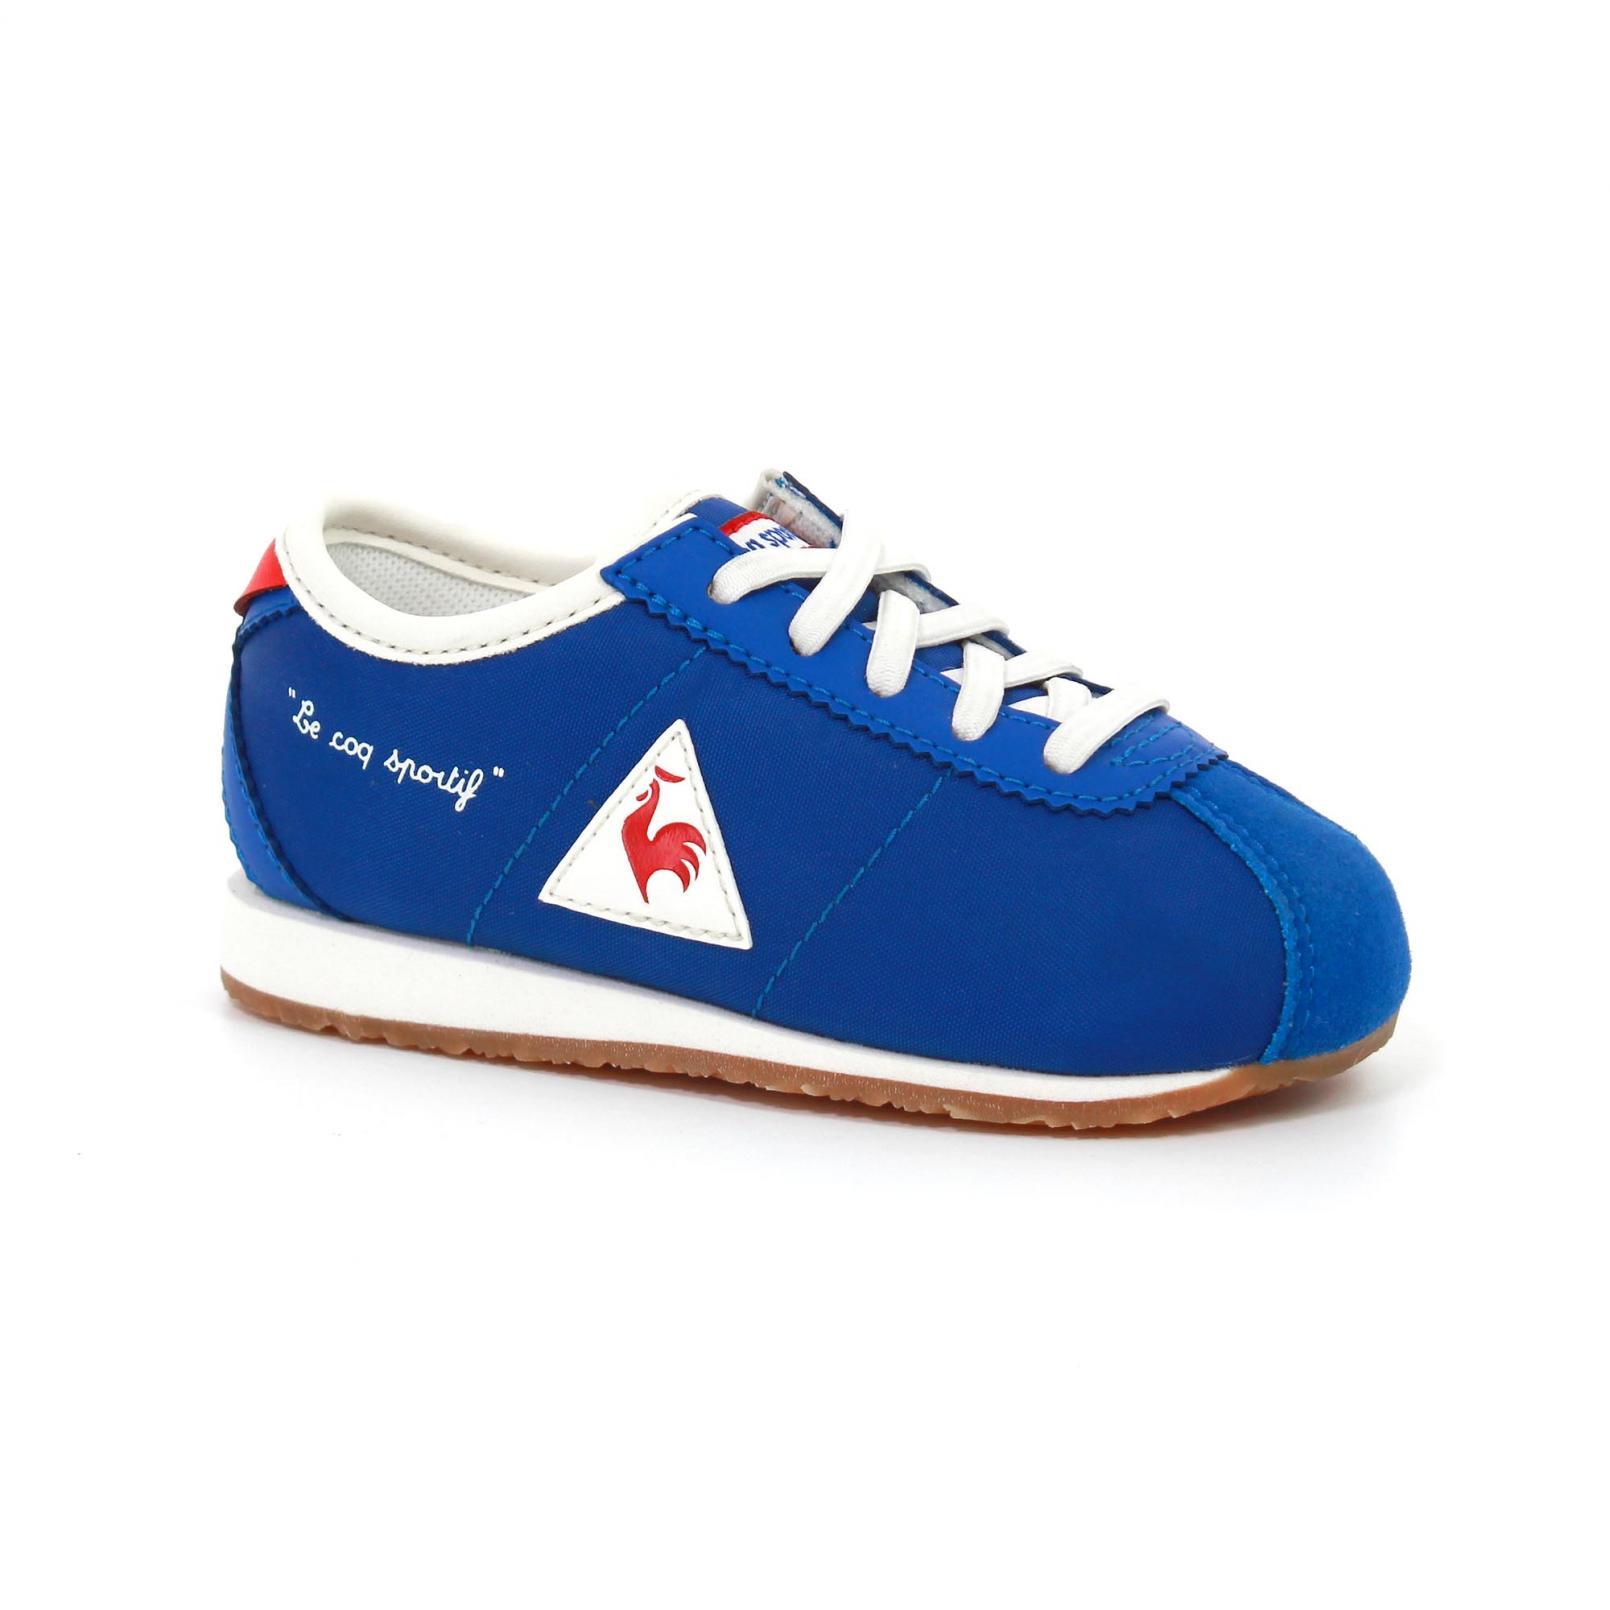 Shoes – Le Coq Sportif Wendon Inf Nylon Blue/Red